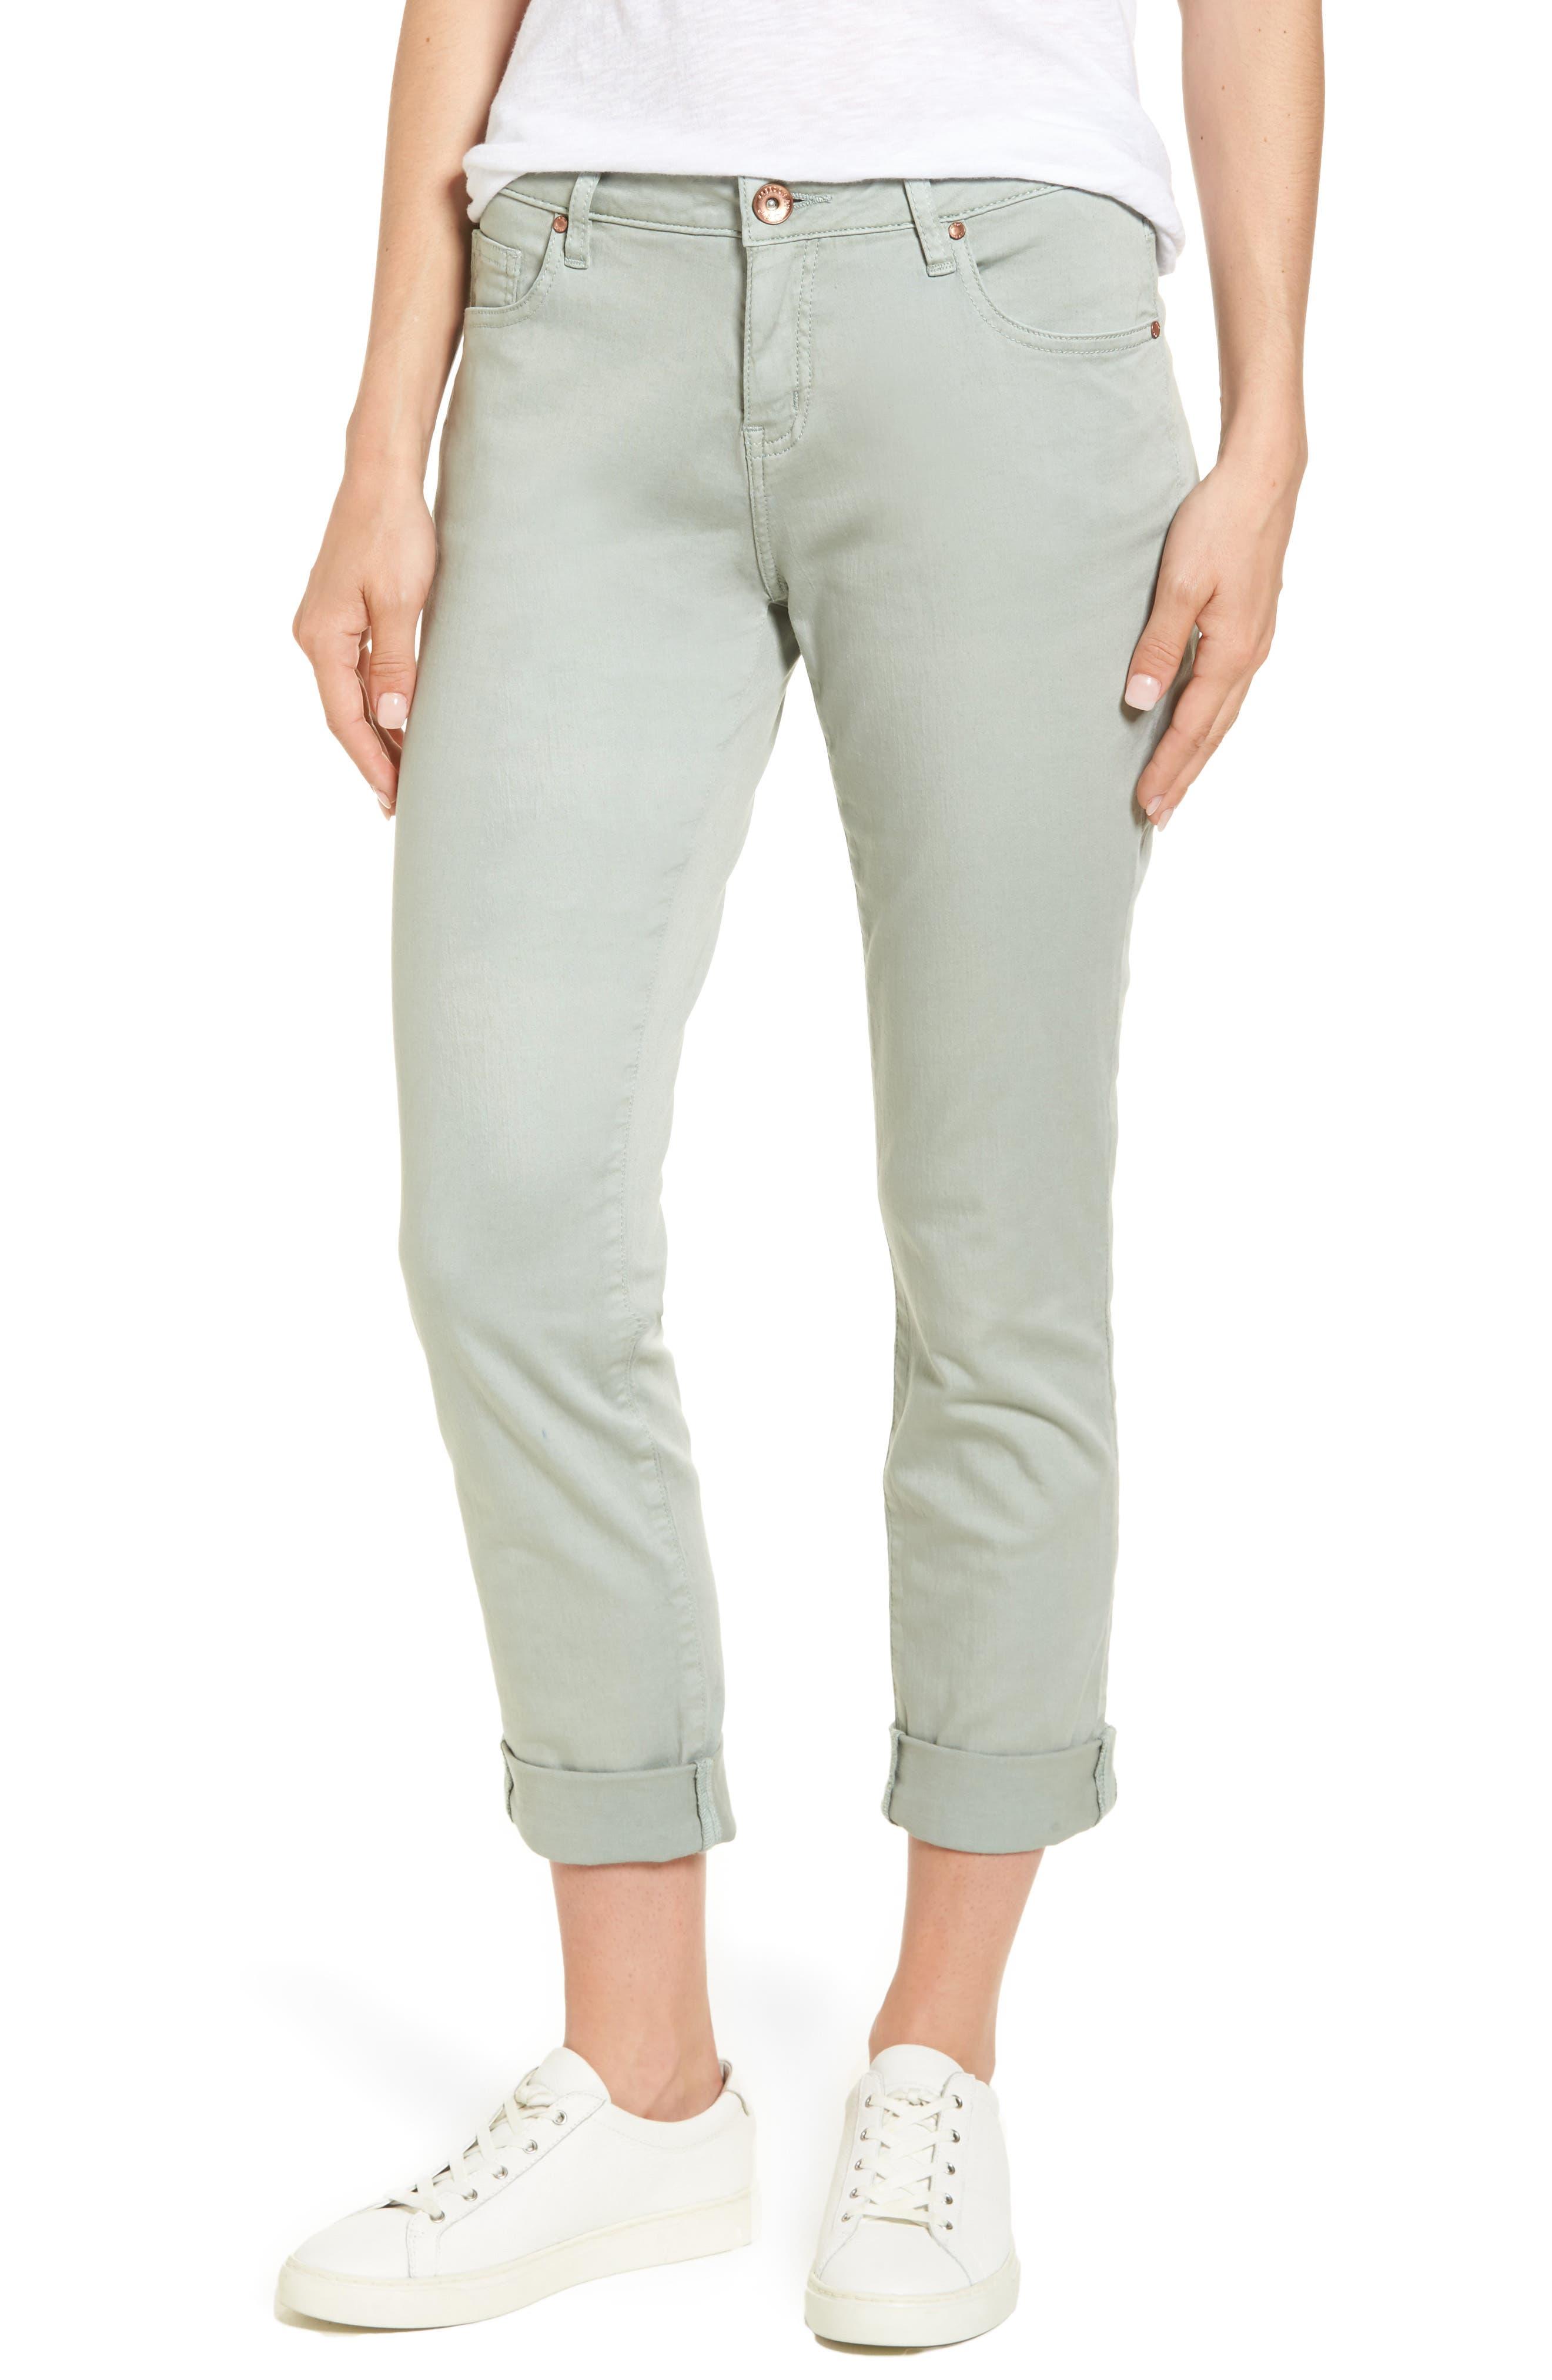 Carter Knit Denim Girlfriend Jeans,                             Main thumbnail 1, color,                             Beach Glass